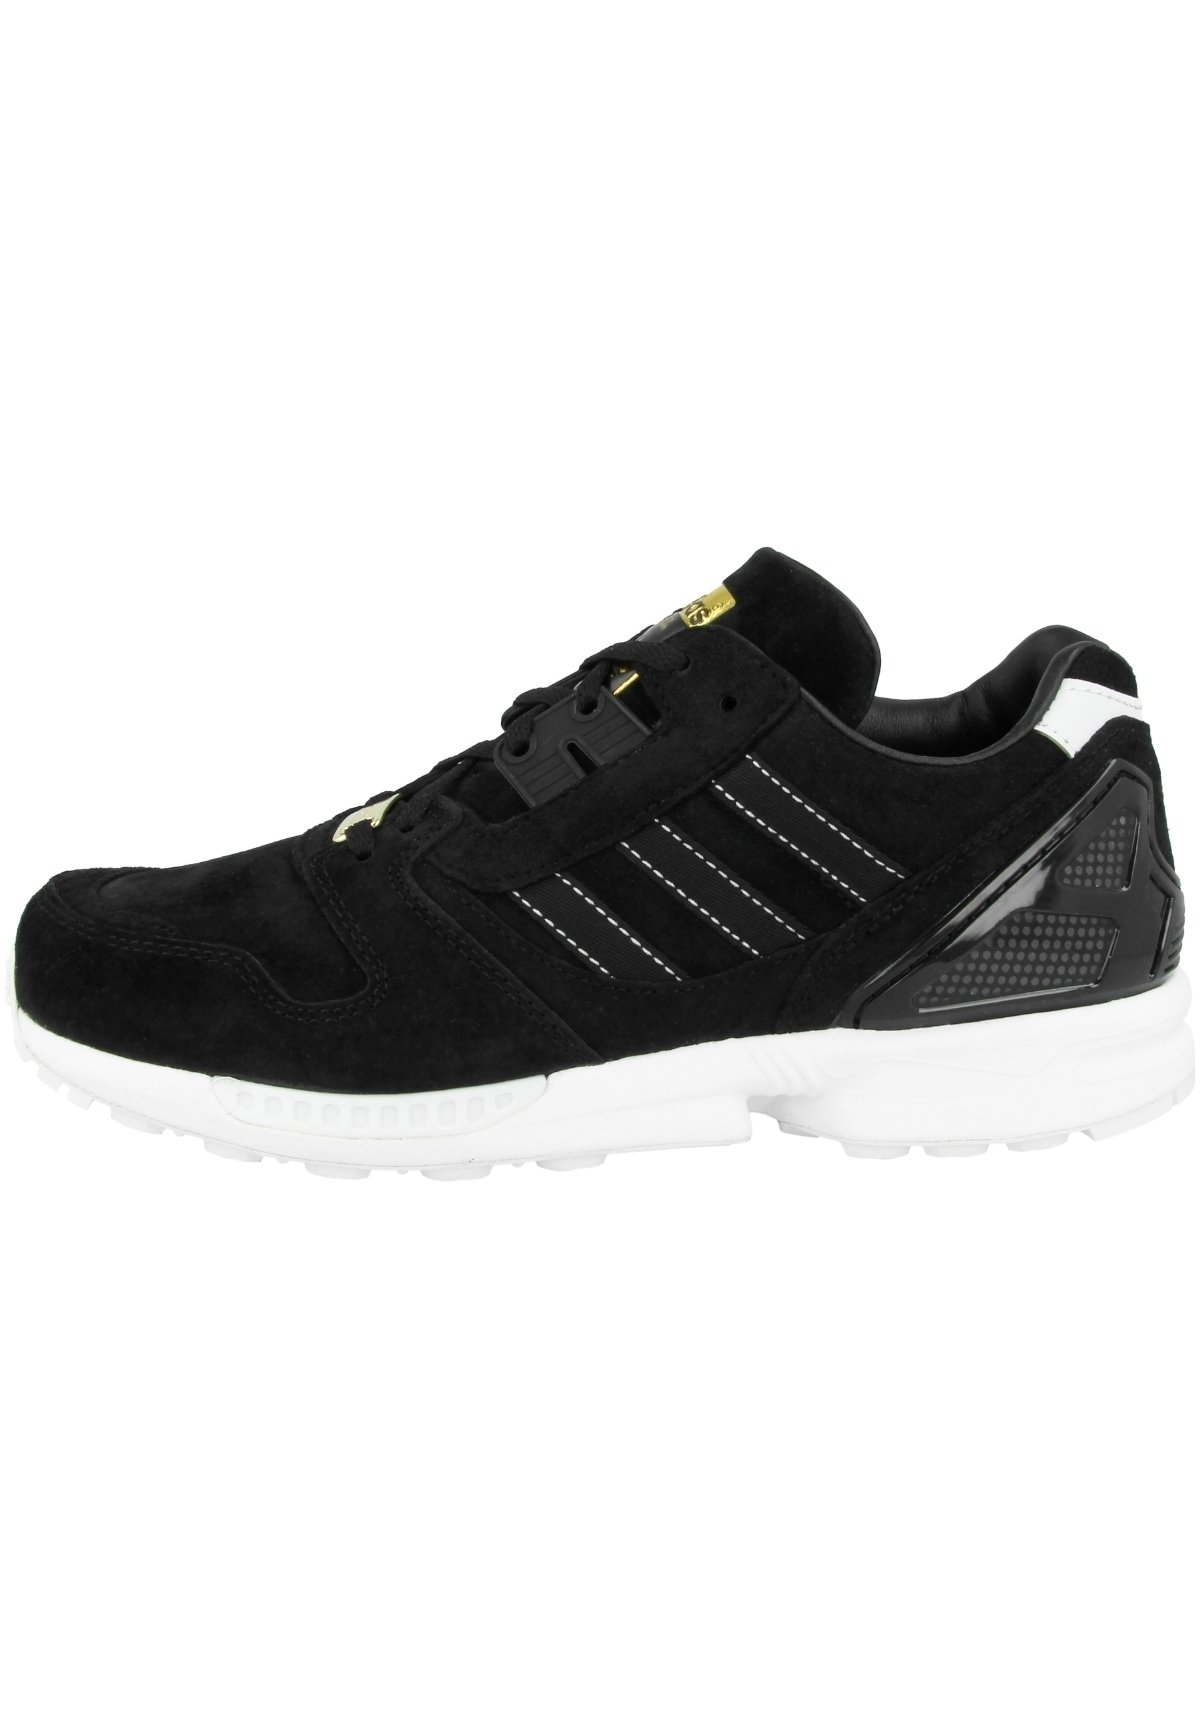 Homme Baskets basses - core black-core black-footwear white